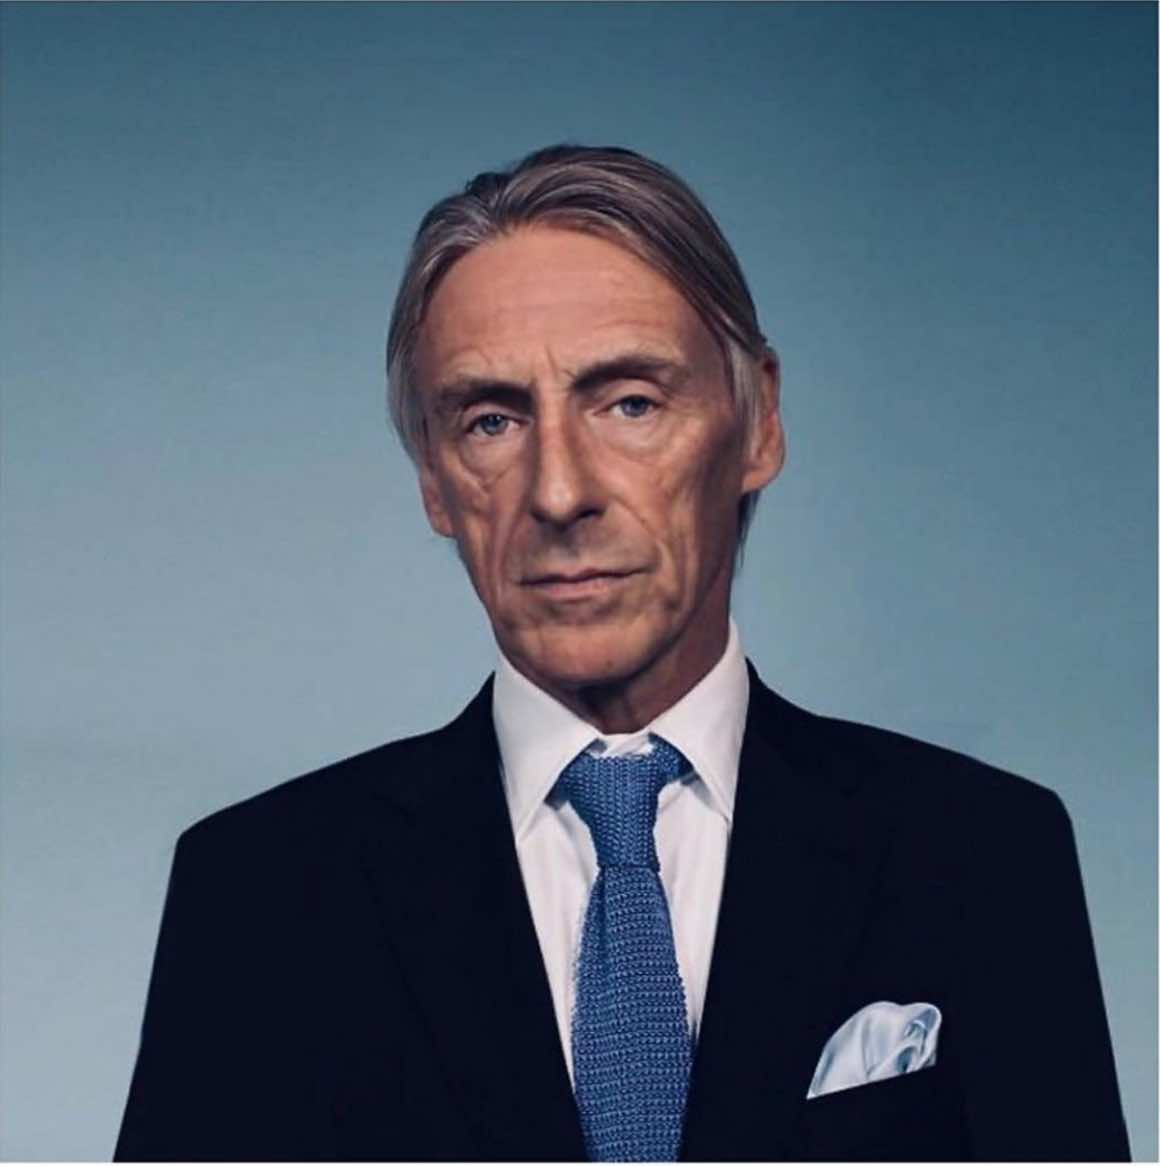 Paul Weller, padre del movimiento mod